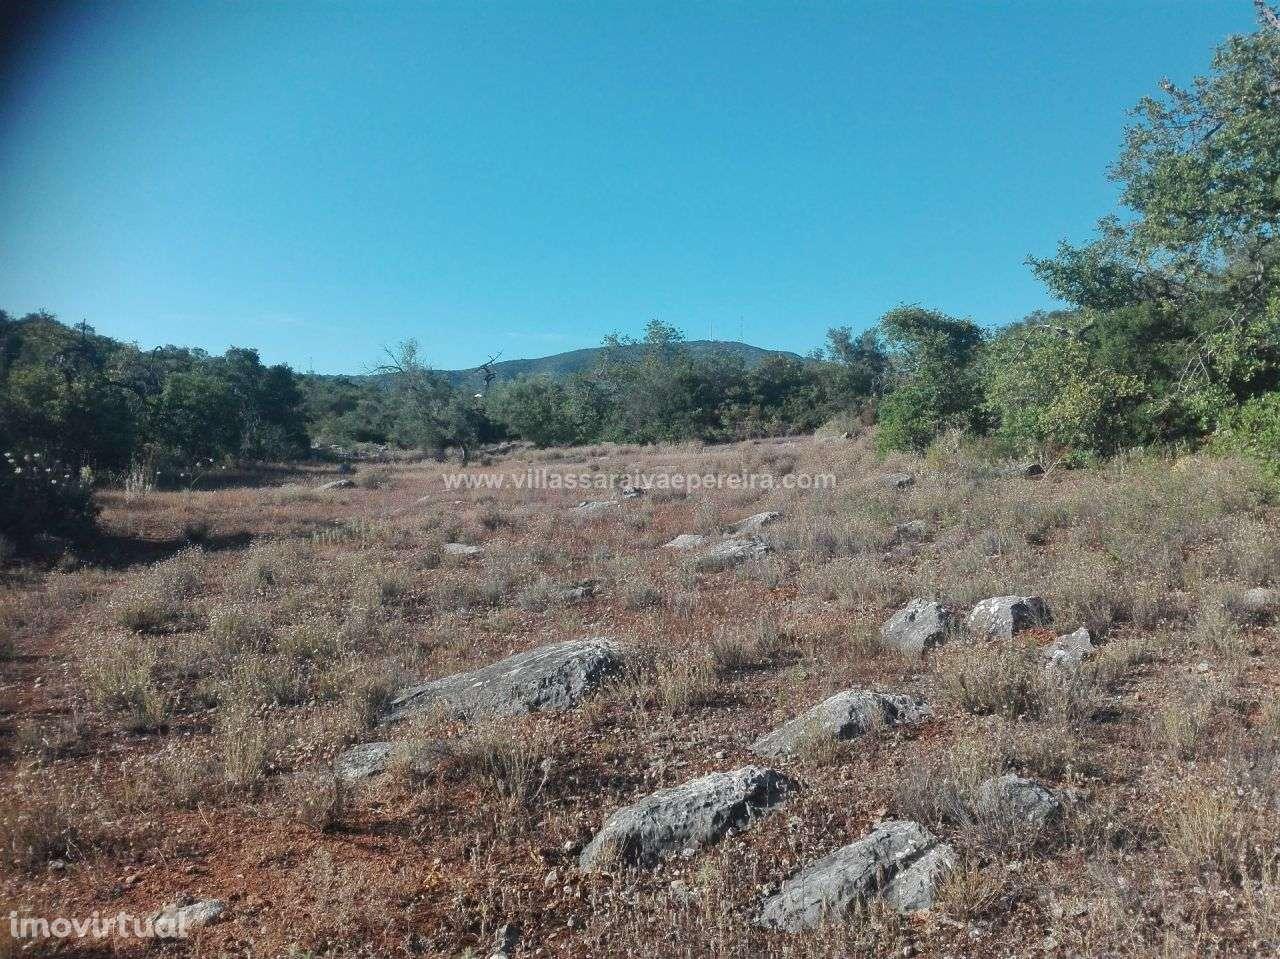 Terreno para comprar, Moncarapacho e Fuseta, Olhão, Faro - Foto 9